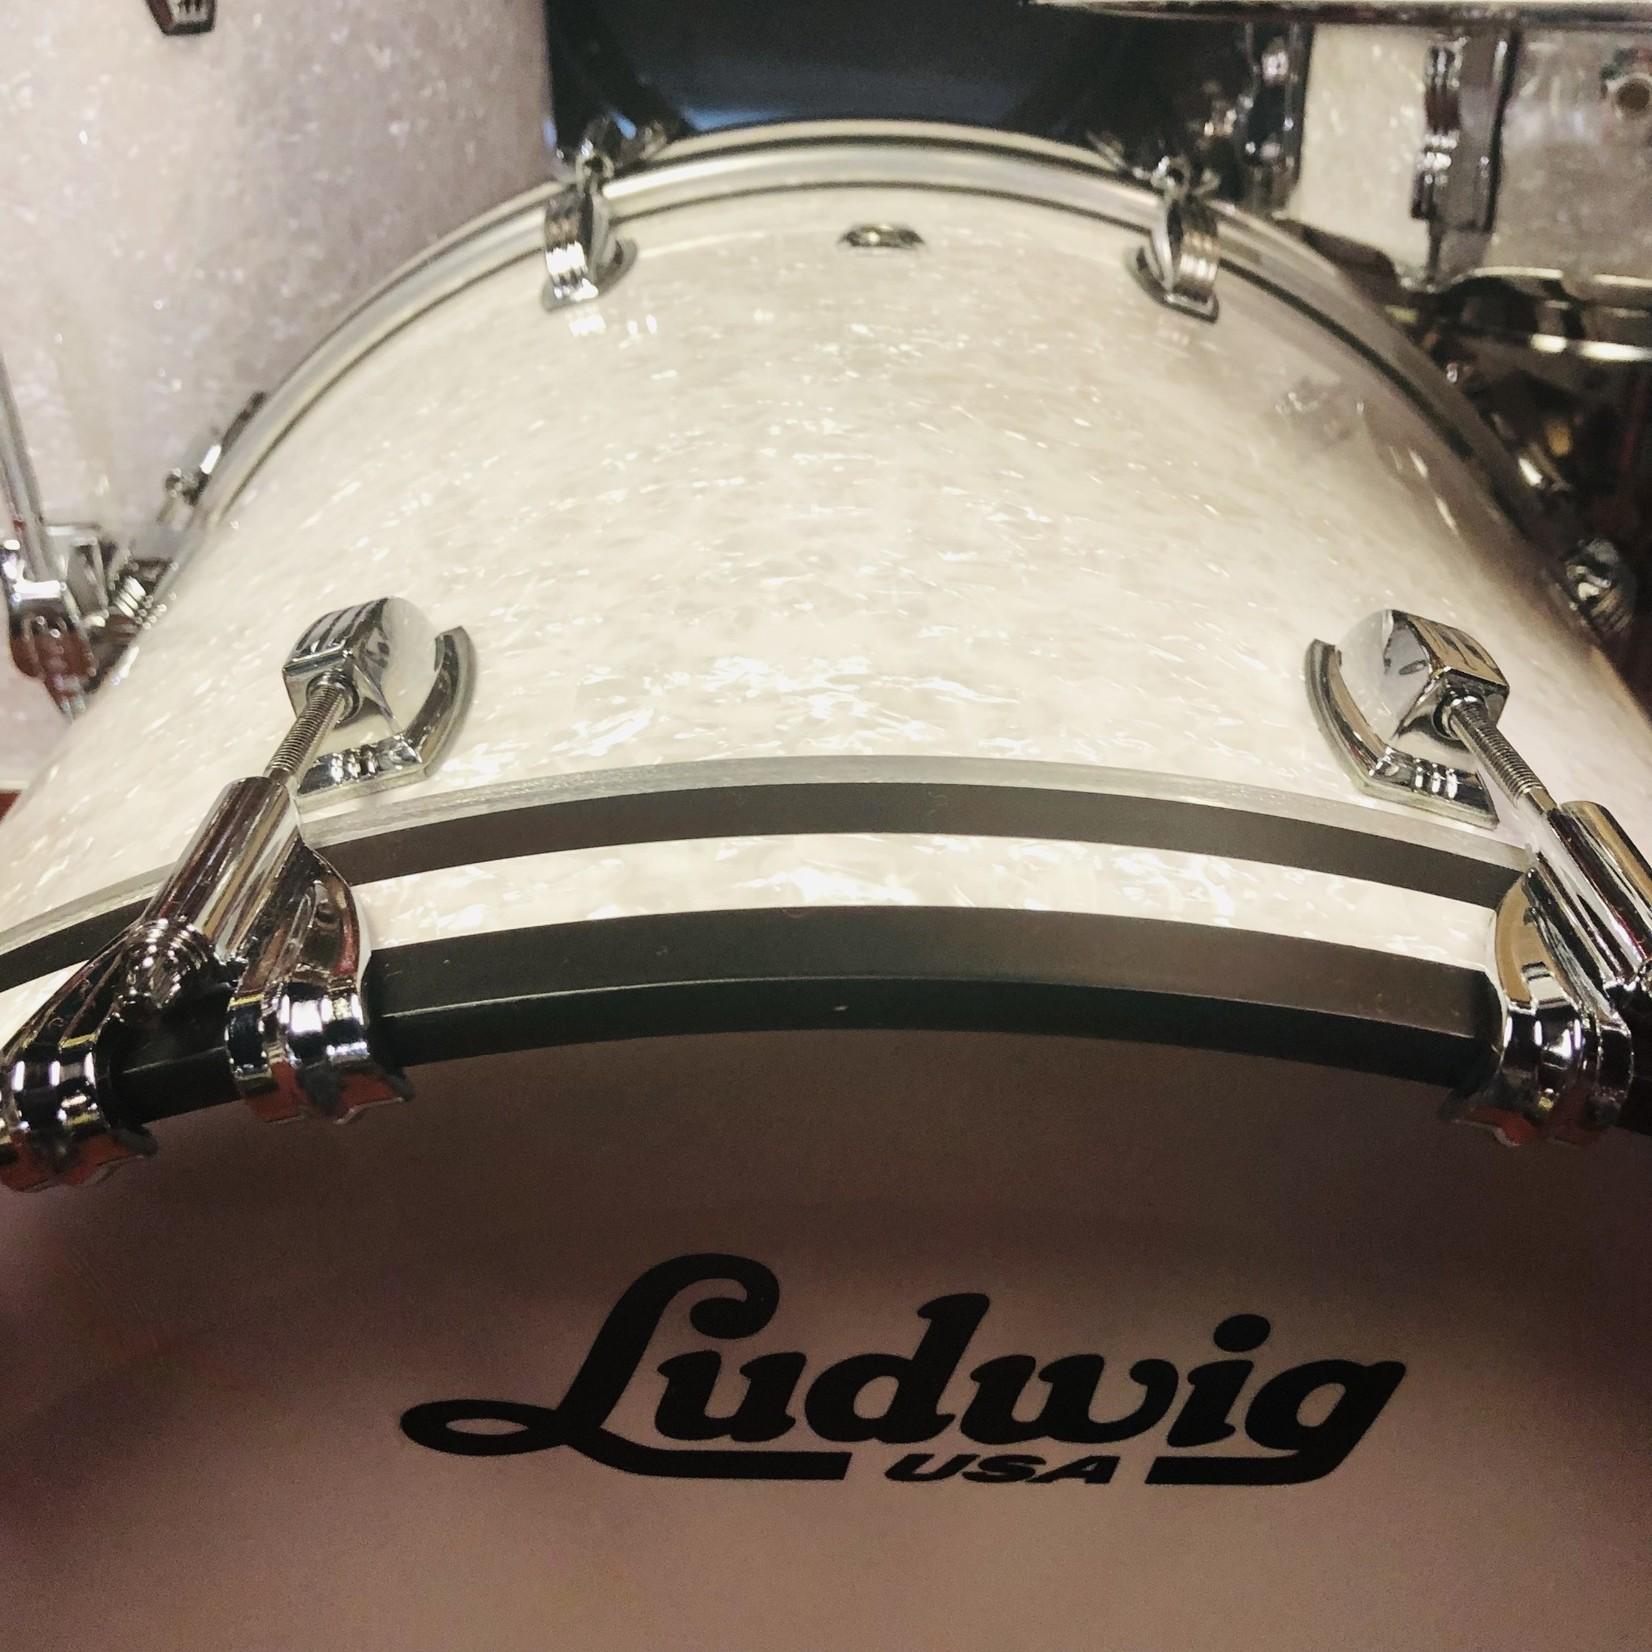 Ludwig LUDWIG CLASSIC OAK 5-PC SHELL PACK 10/12/16/22/14S (WHITE MARINE)